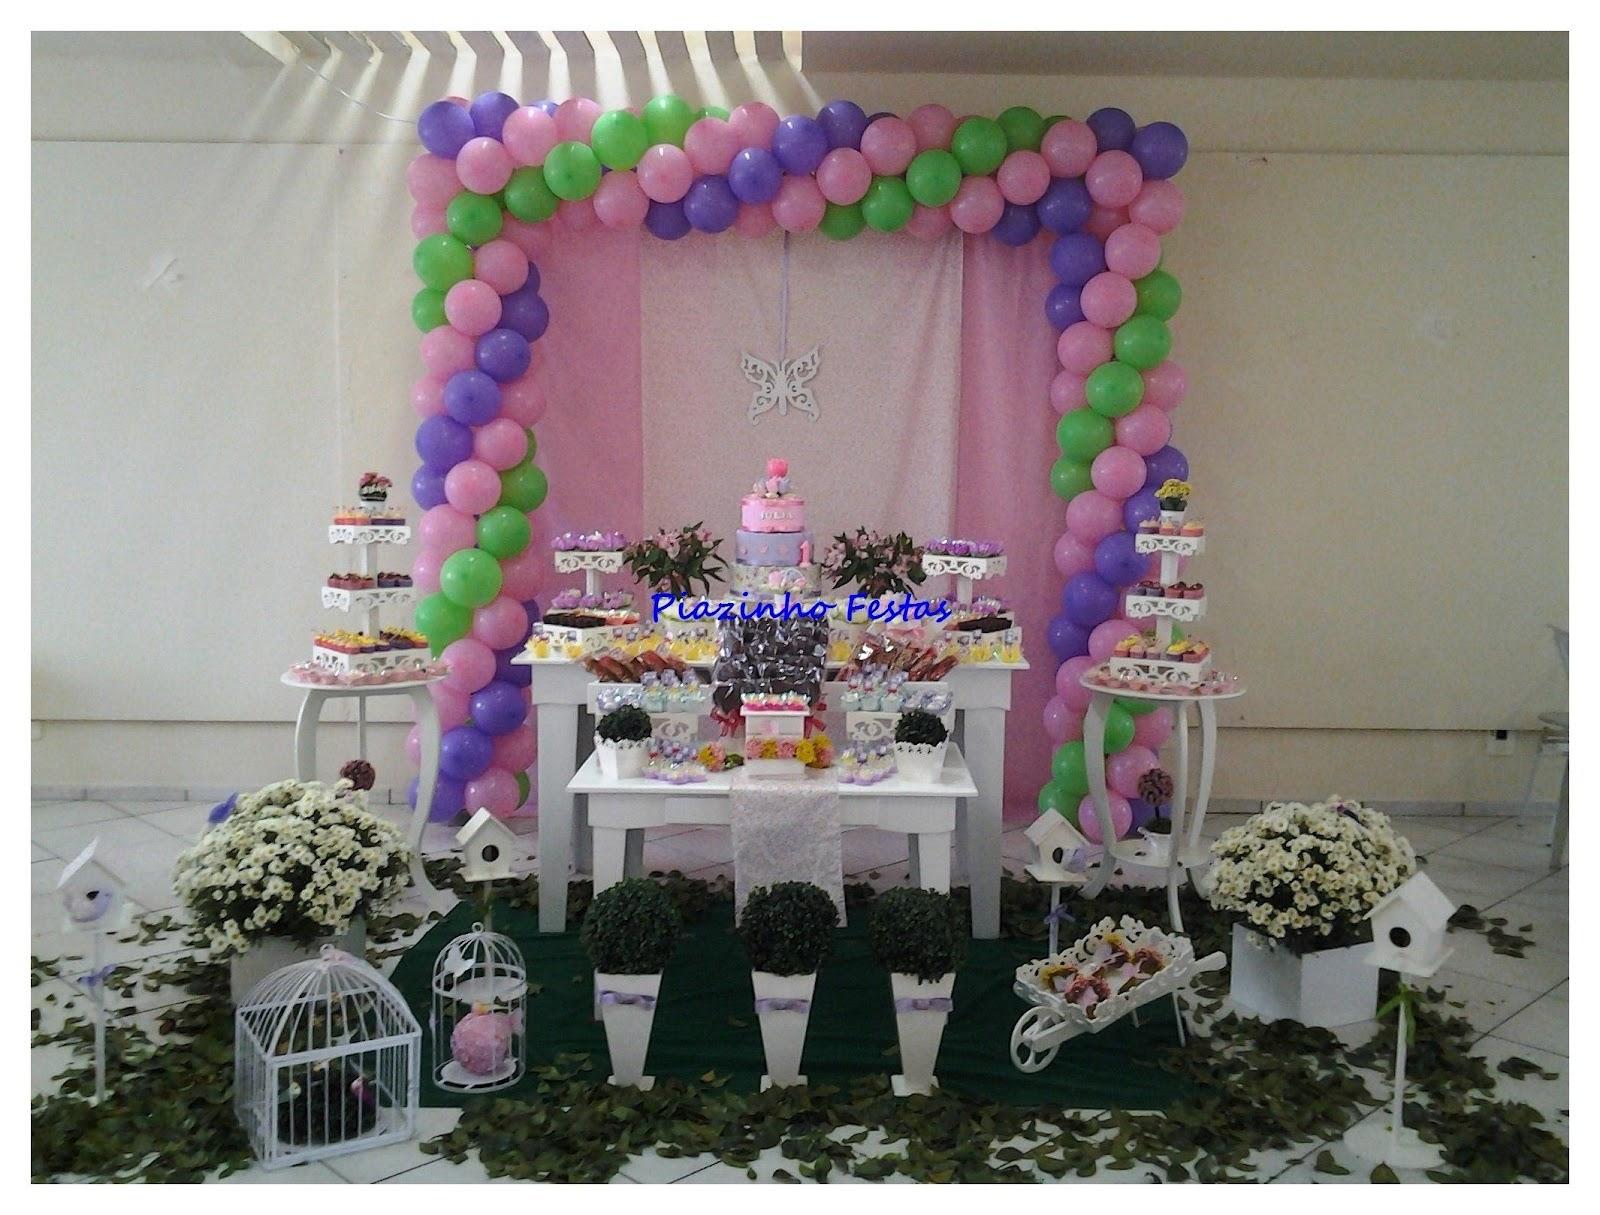 decoracao de festa infantil tema jardim:Festa Infantil por Rozangela Mazur